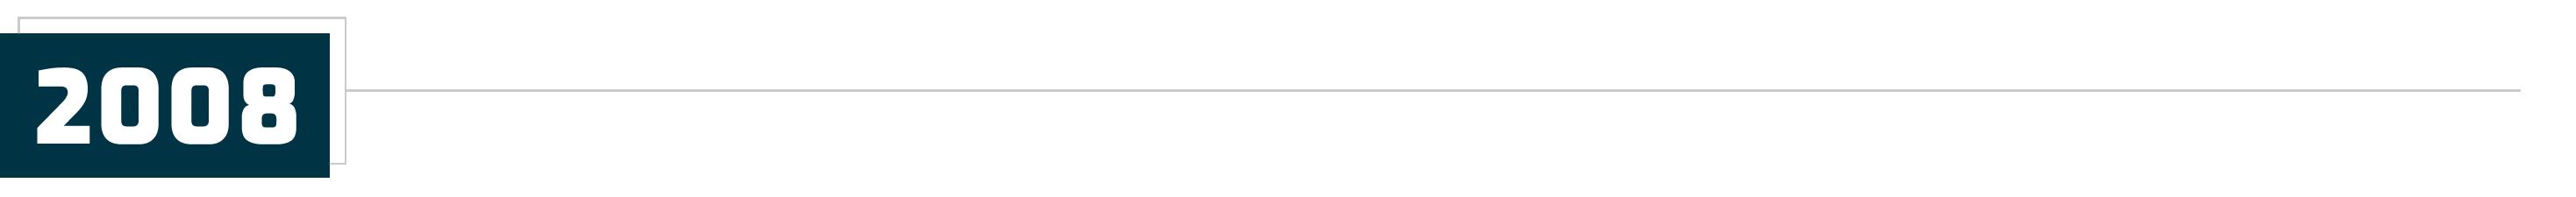 Choice Bank Timeline 2008